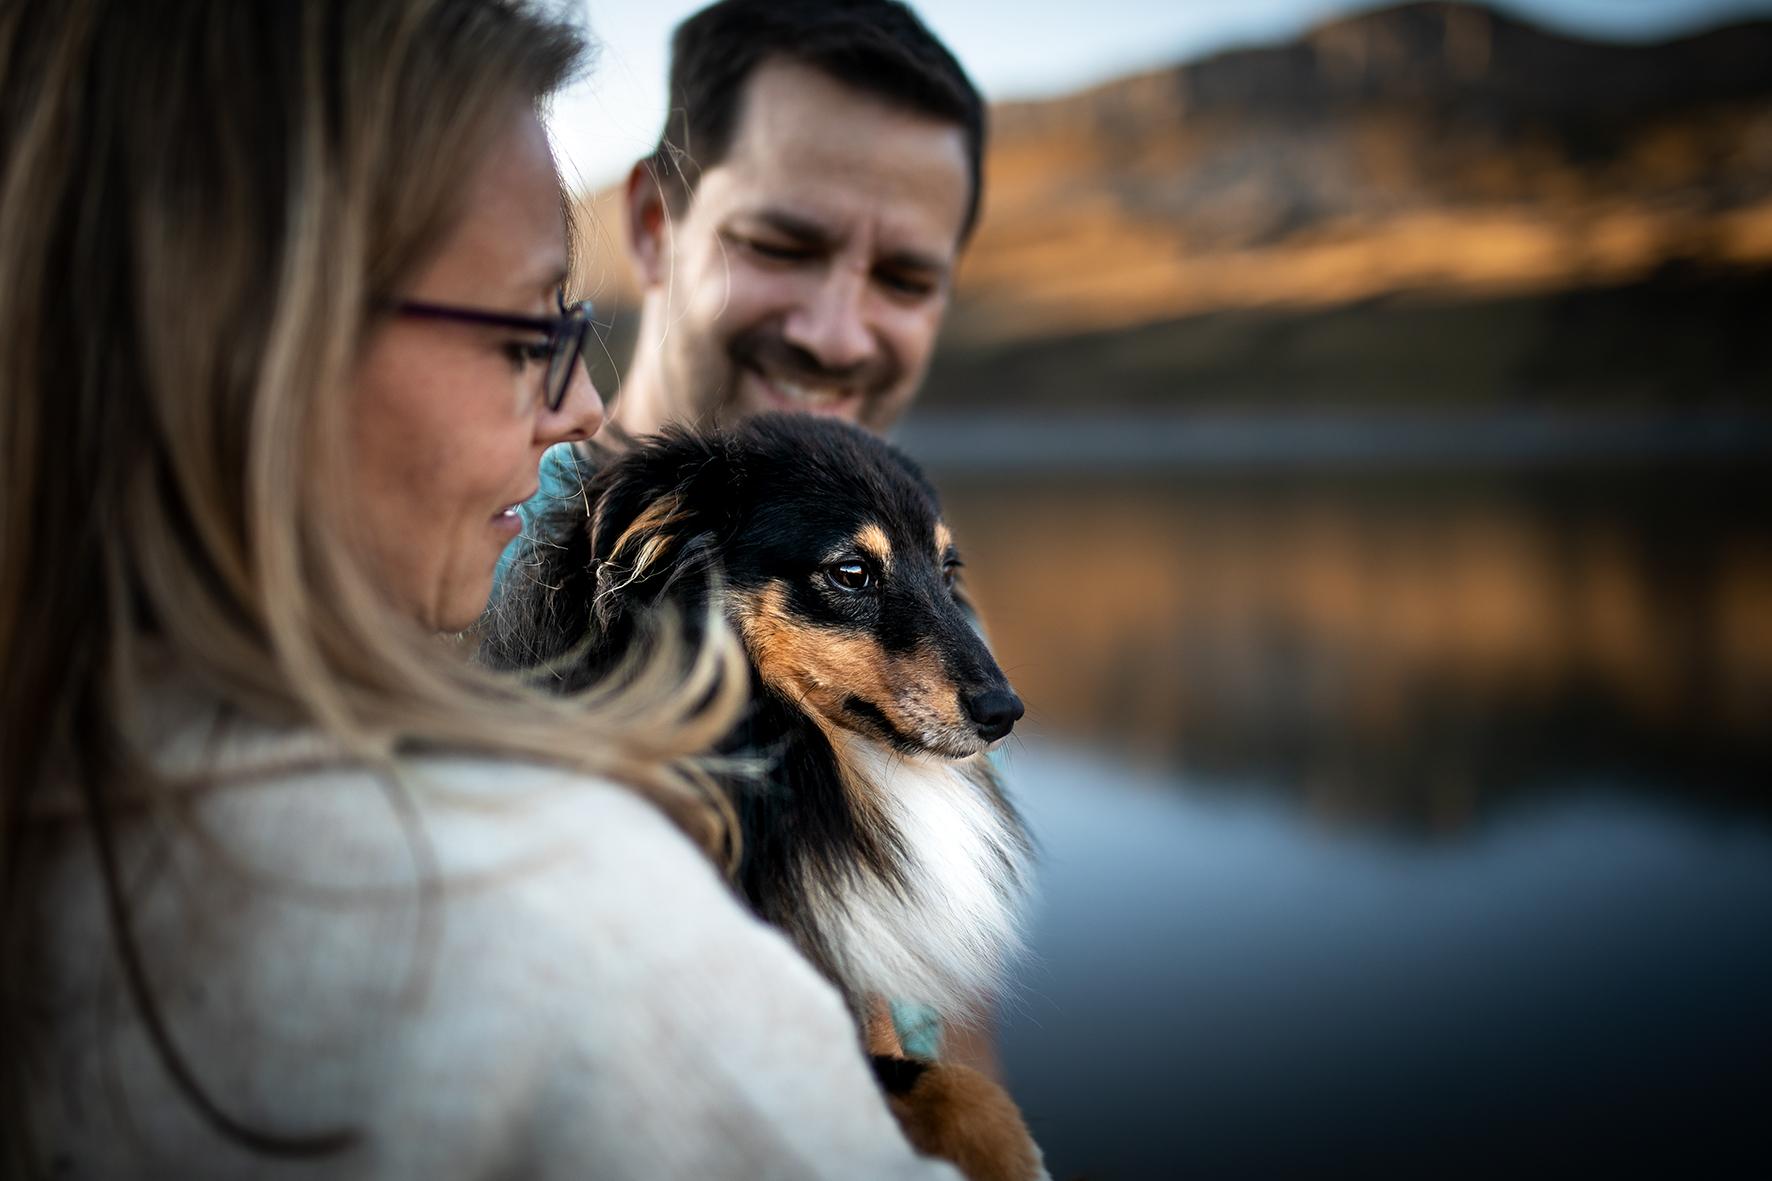 Familienshooting_Familienfotografie_Luzern_Schweiz_17